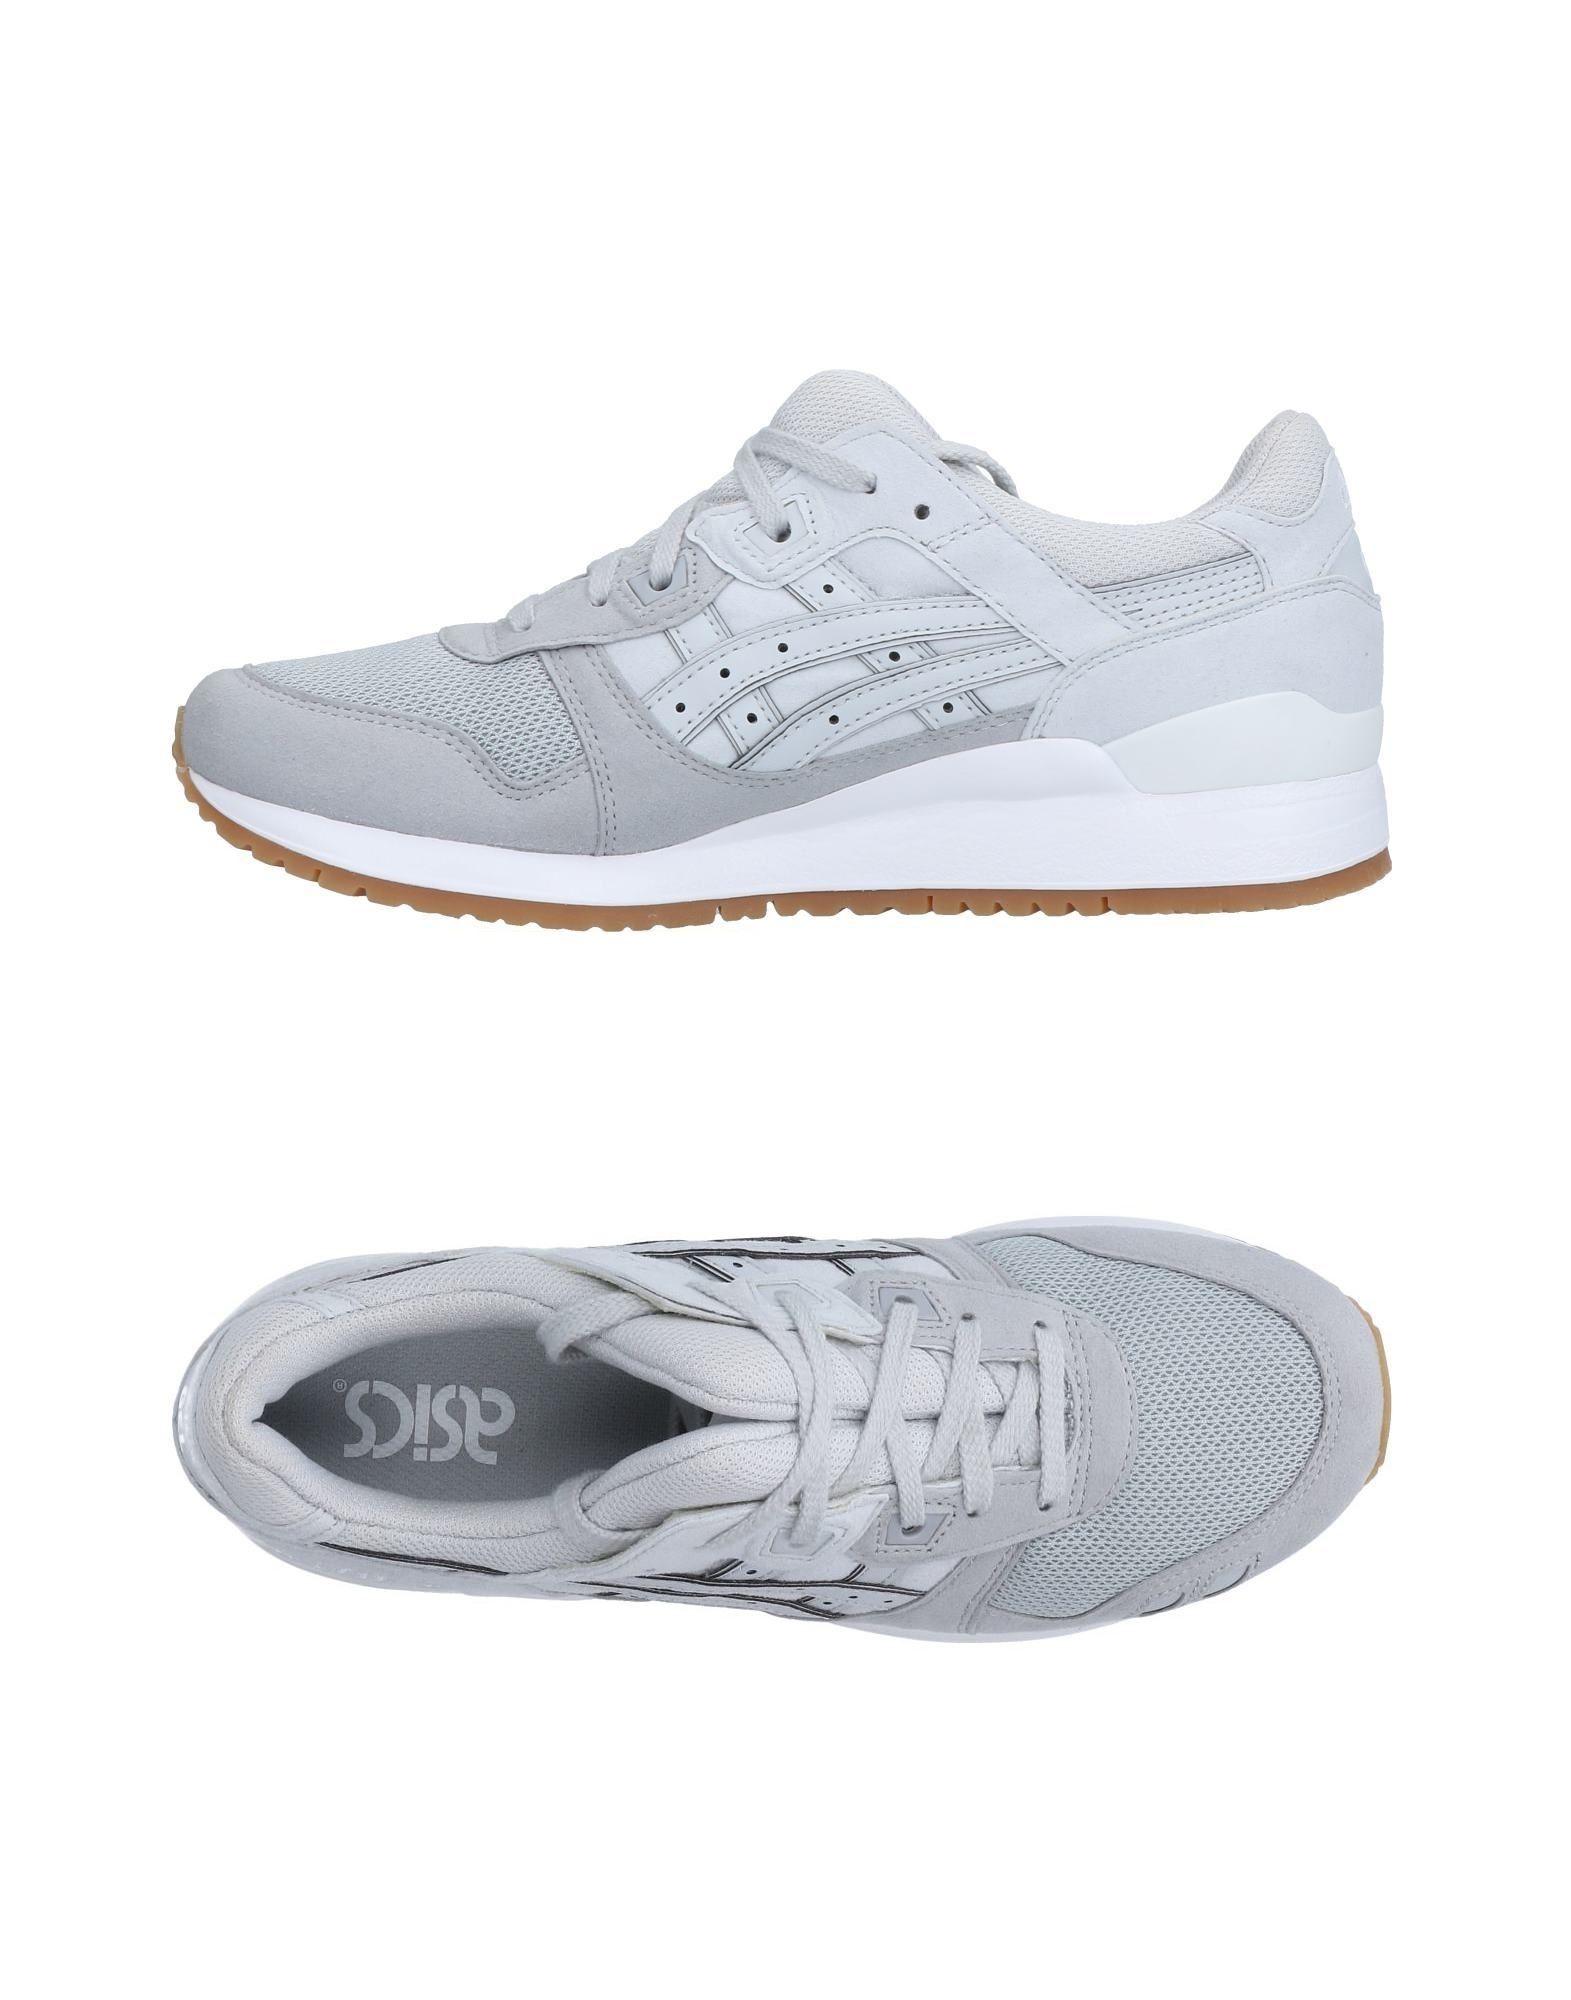 Moda Sneakers Asics Asics Sneakers Uomo - 11511939CB e0dc3d